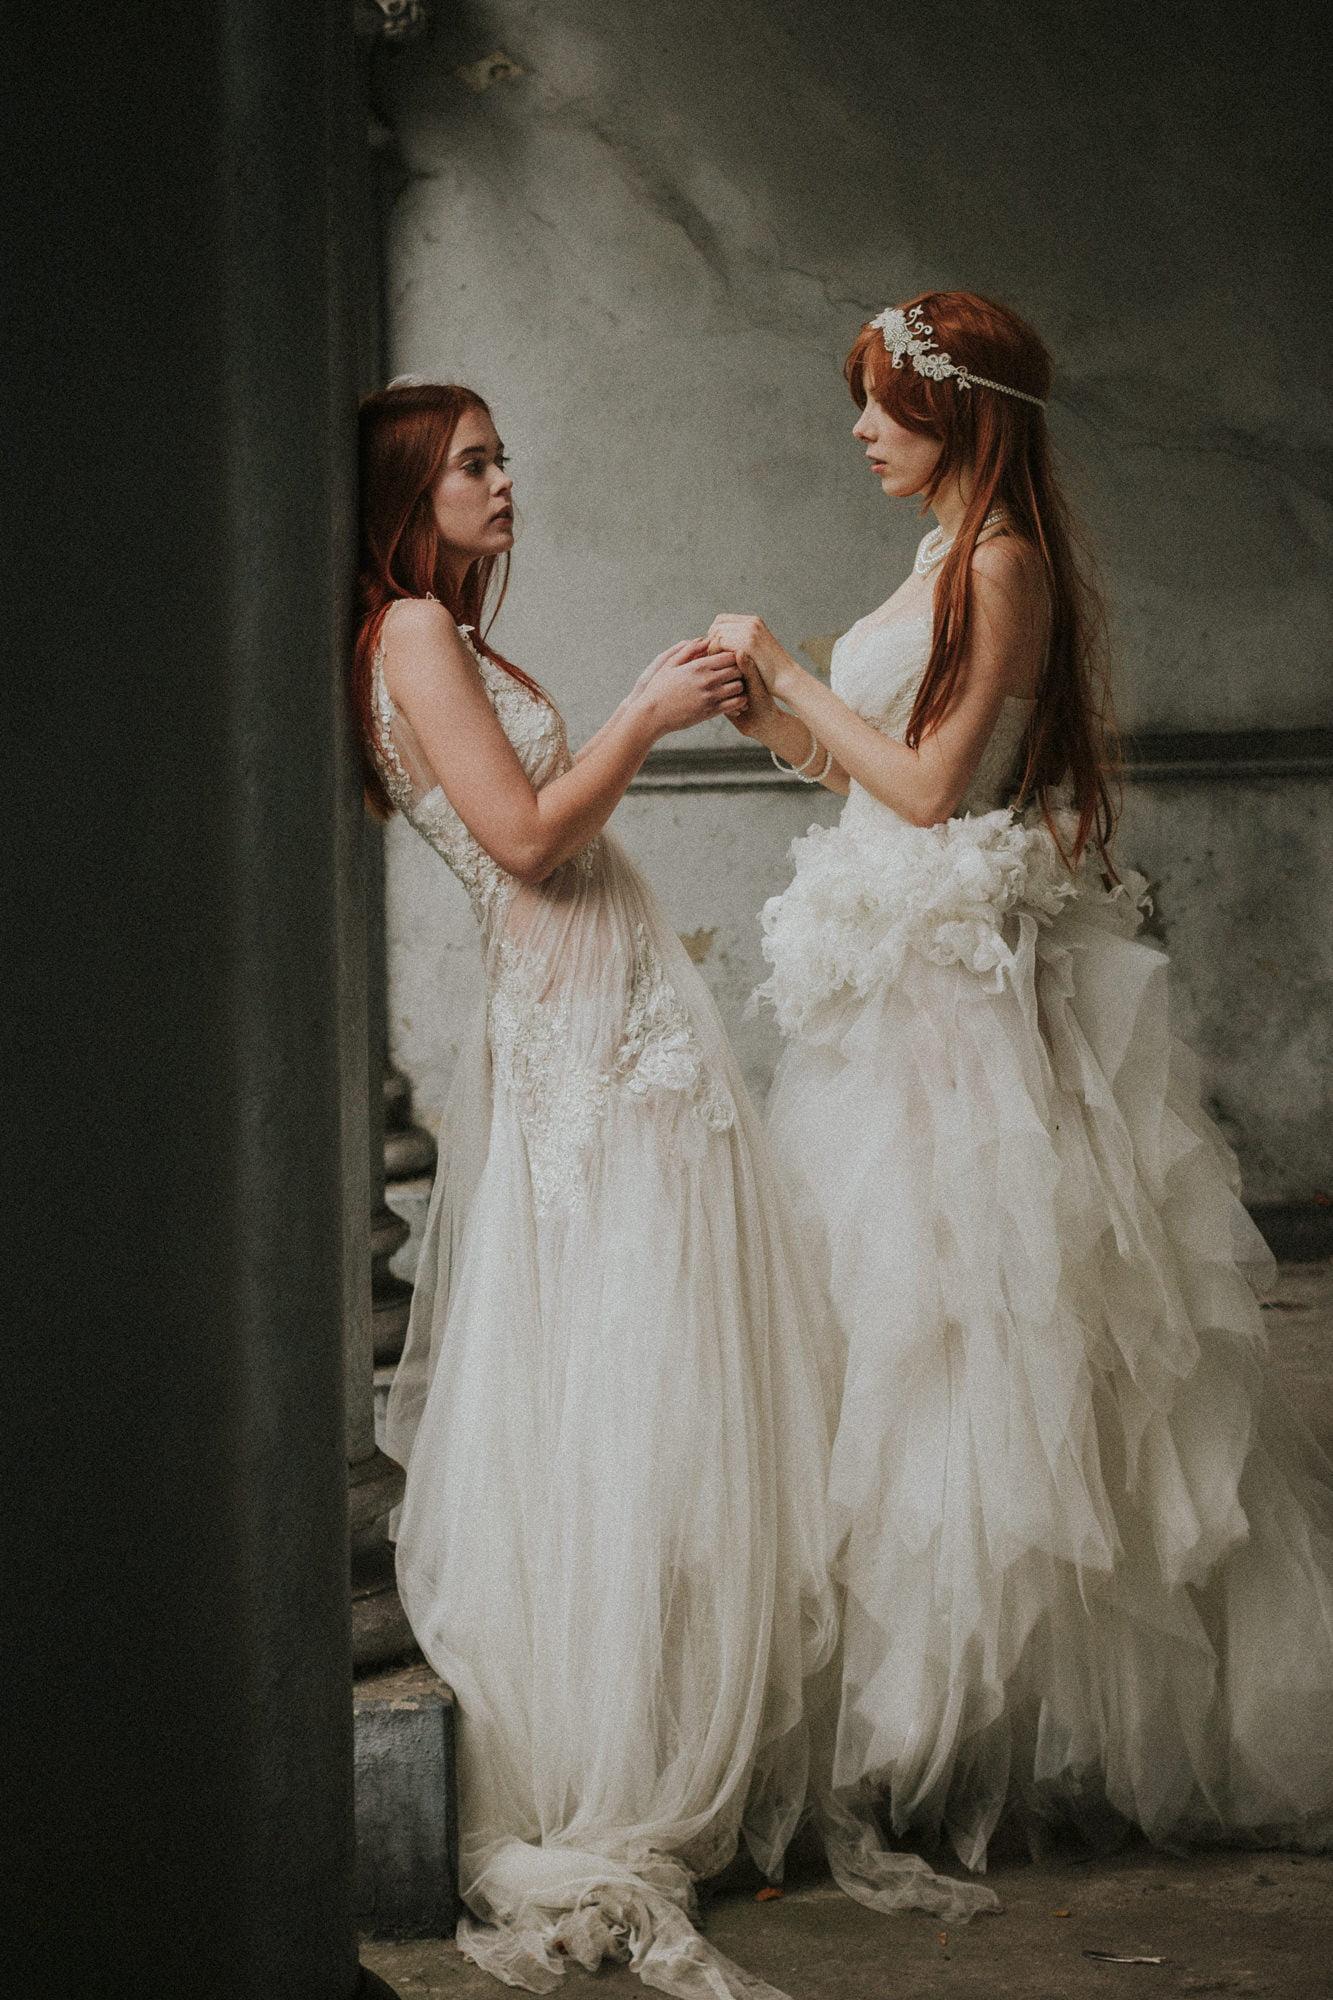 Intimate Wedding Photographer Scotland